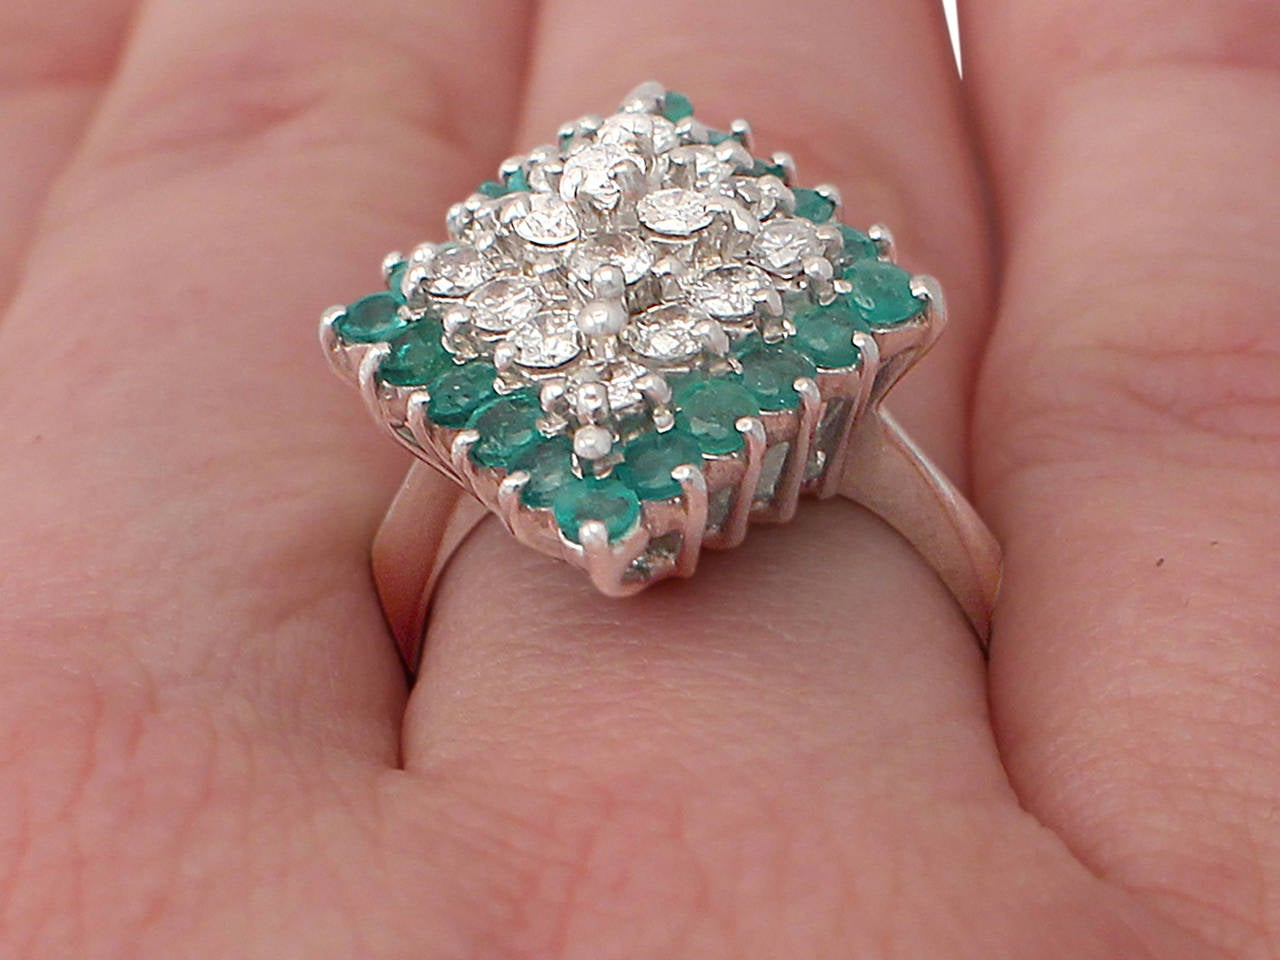 1975 Emerald & 1.36 Carat Diamond White Gold Cocktail Ring 9